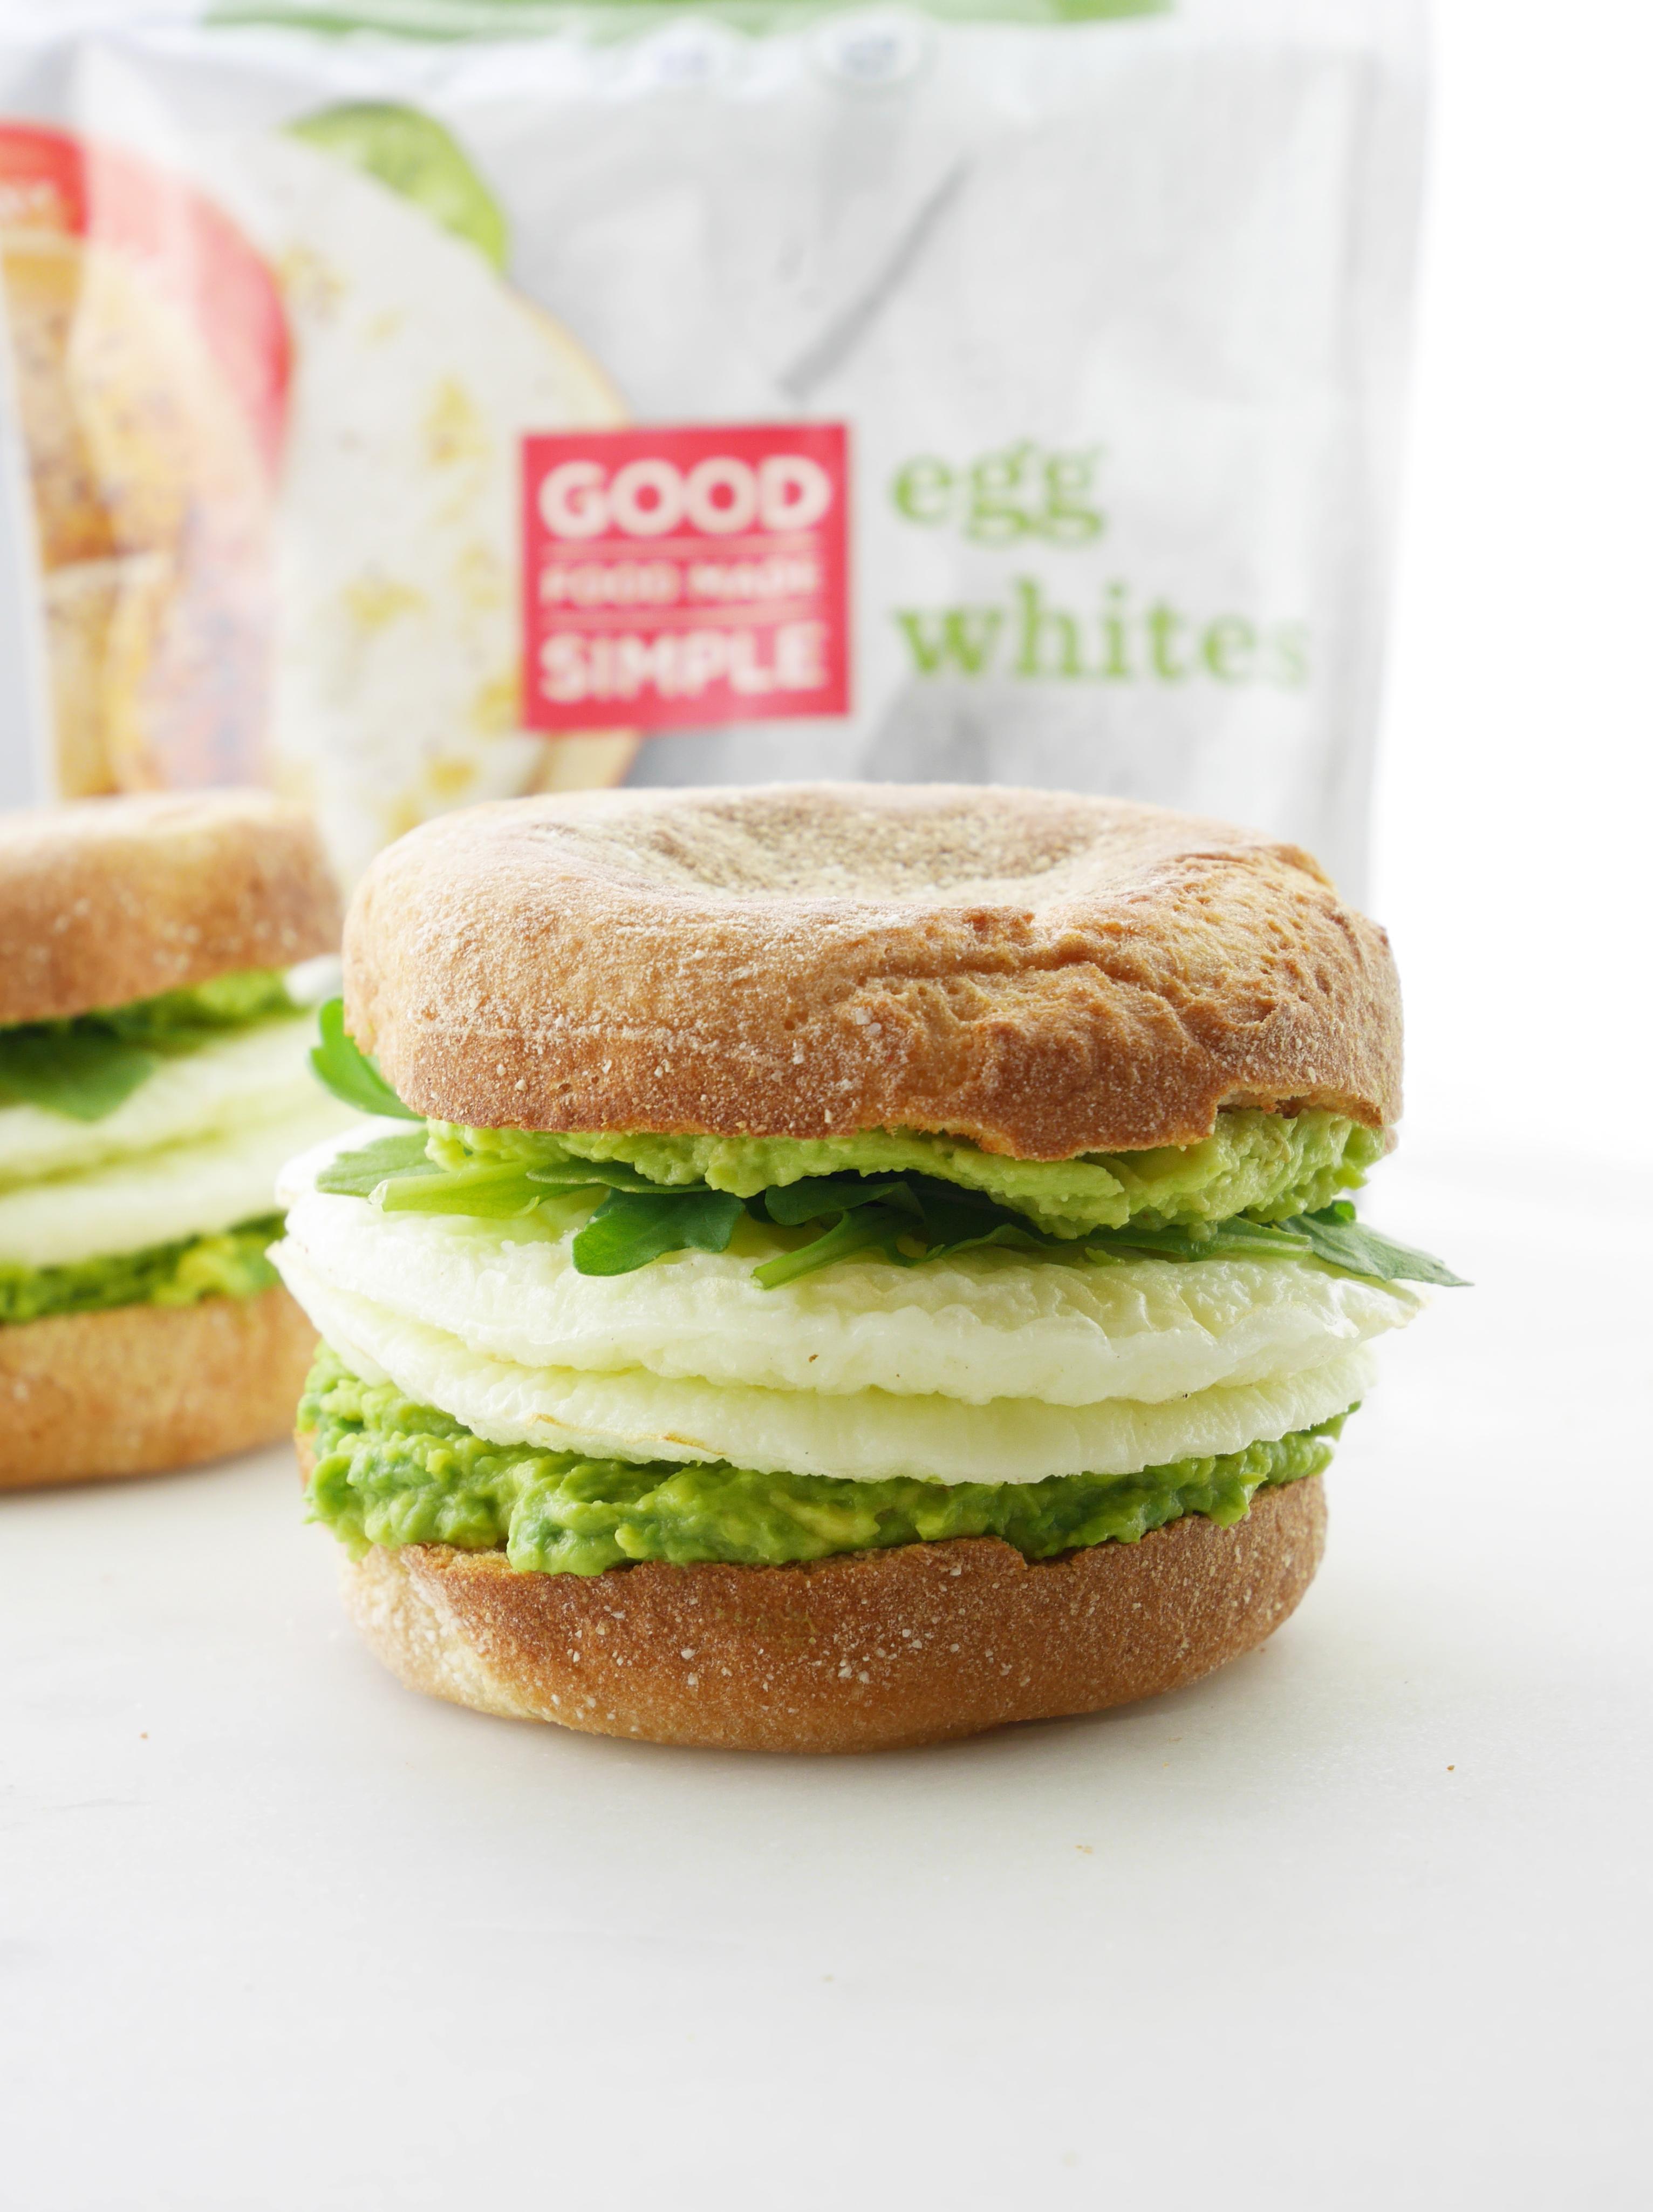 GOOD FOOD MADE SIMPLE EGG WHITES